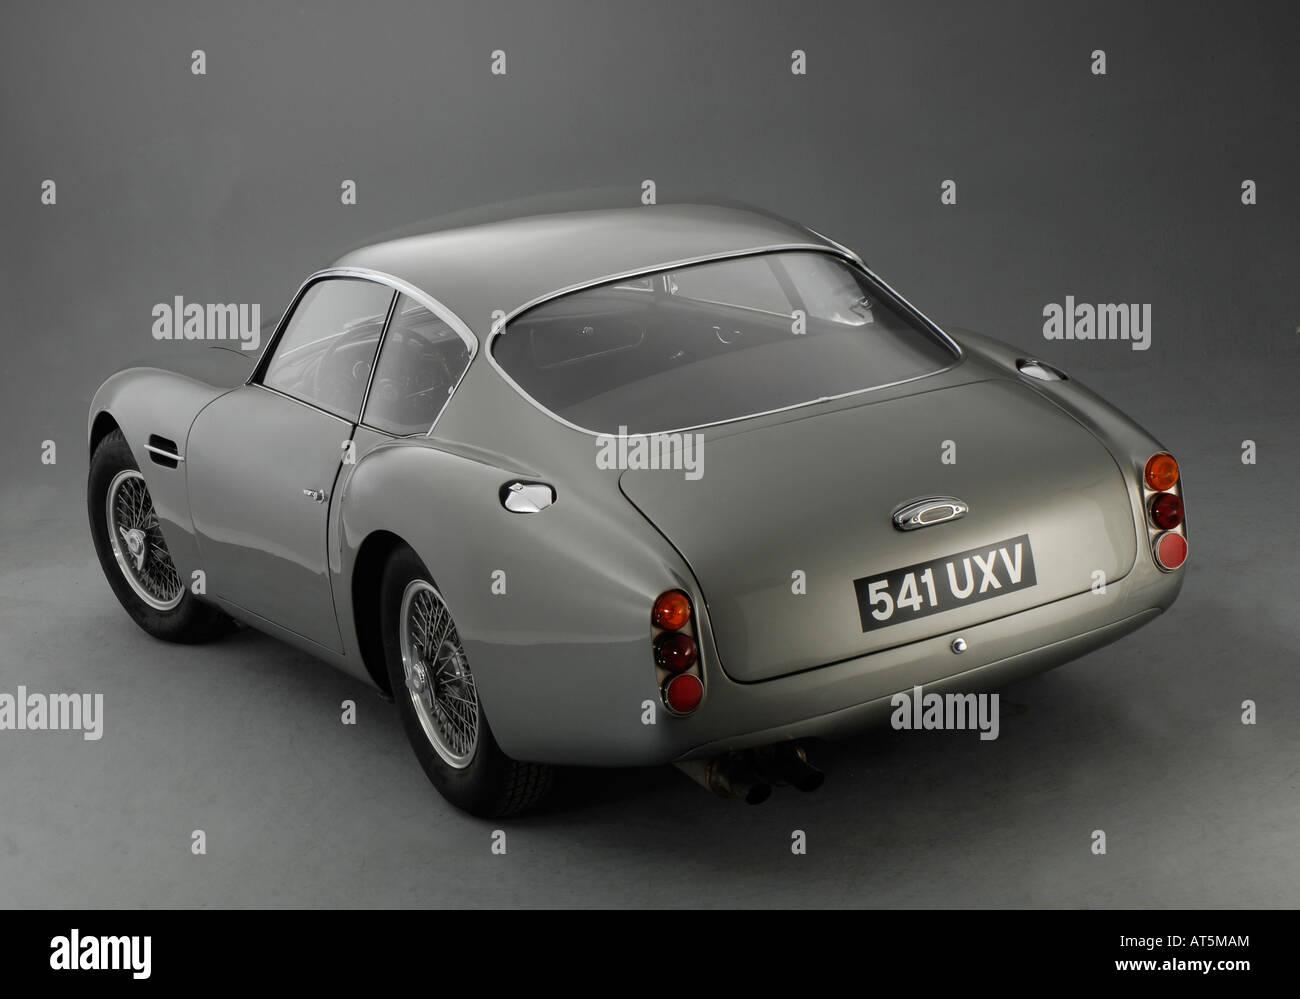 1961 Aston Martin Db4 Gt Zagato Rear Three Quarter View Stock Photo Alamy